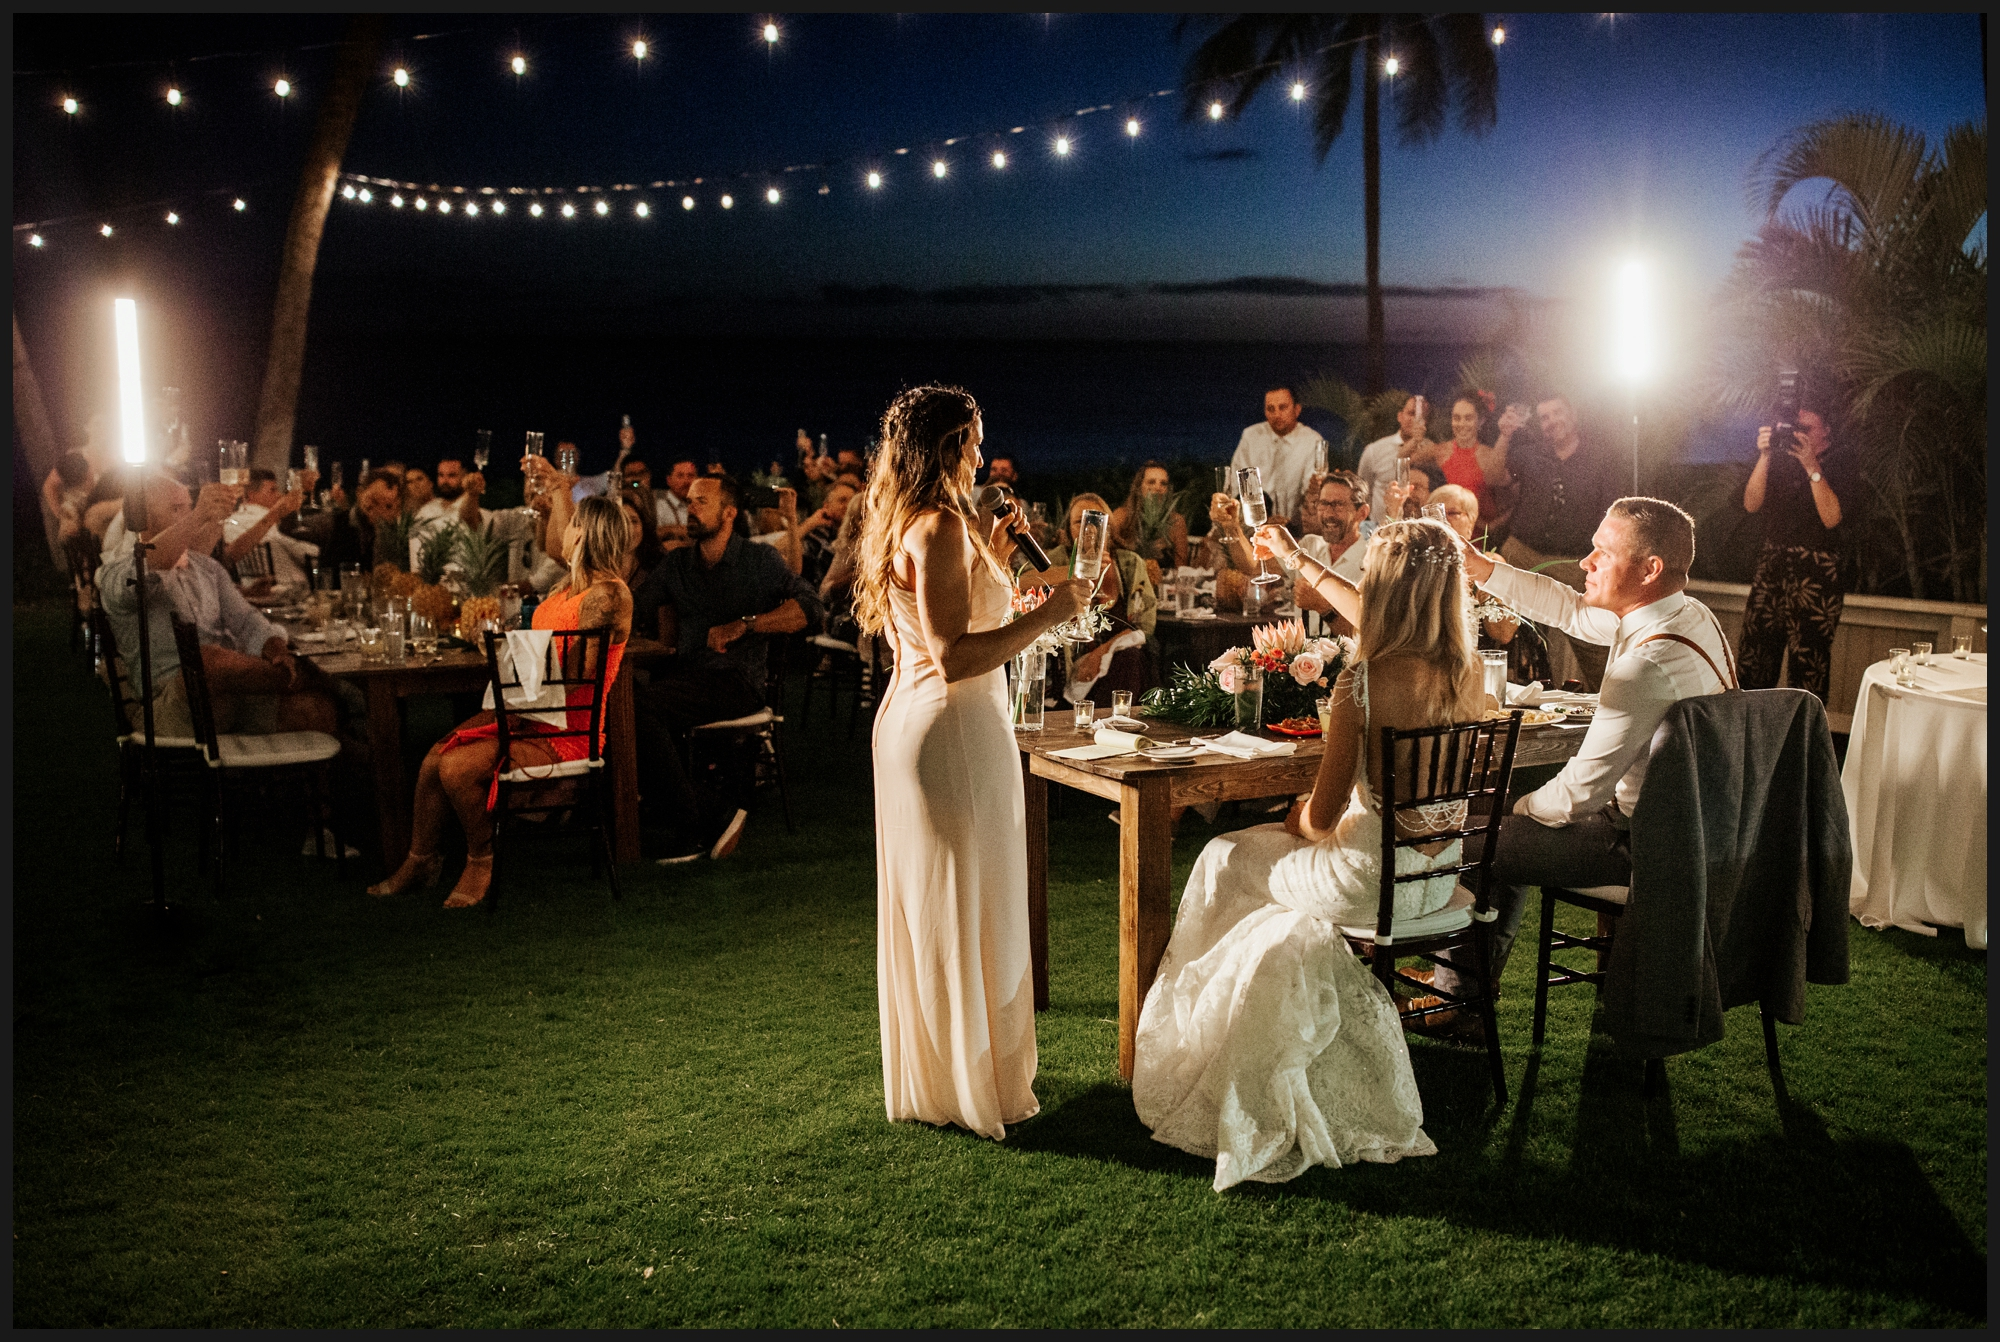 Orlando-Wedding-Photographer-destination-wedding-photographer-florida-wedding-photographer-hawaii-wedding-photographer_0092.jpg